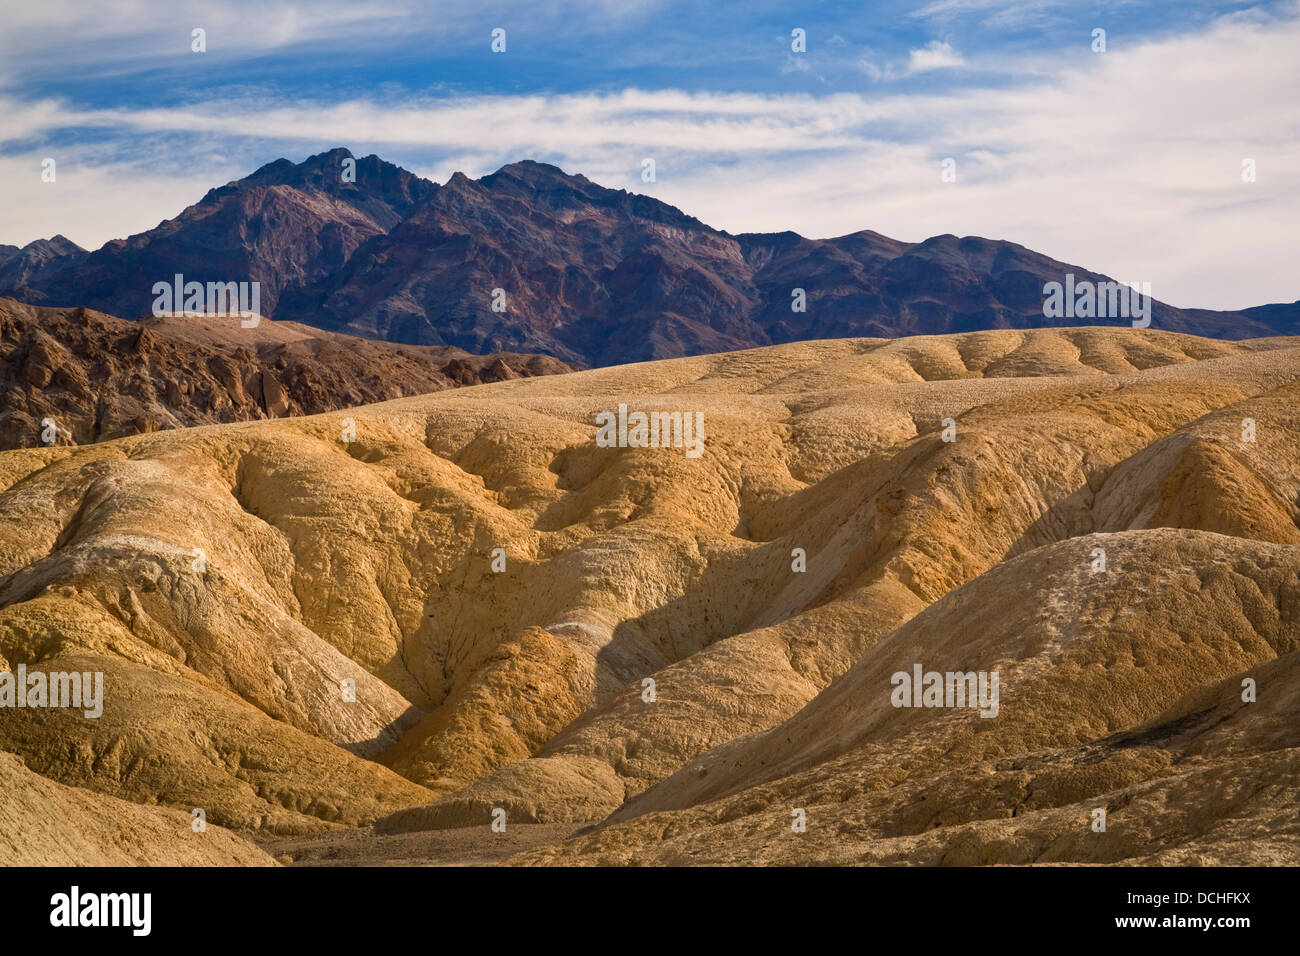 Eroded hillside, Twenty Mule Team Canyon, Death Valley National Park, California Stock Photo